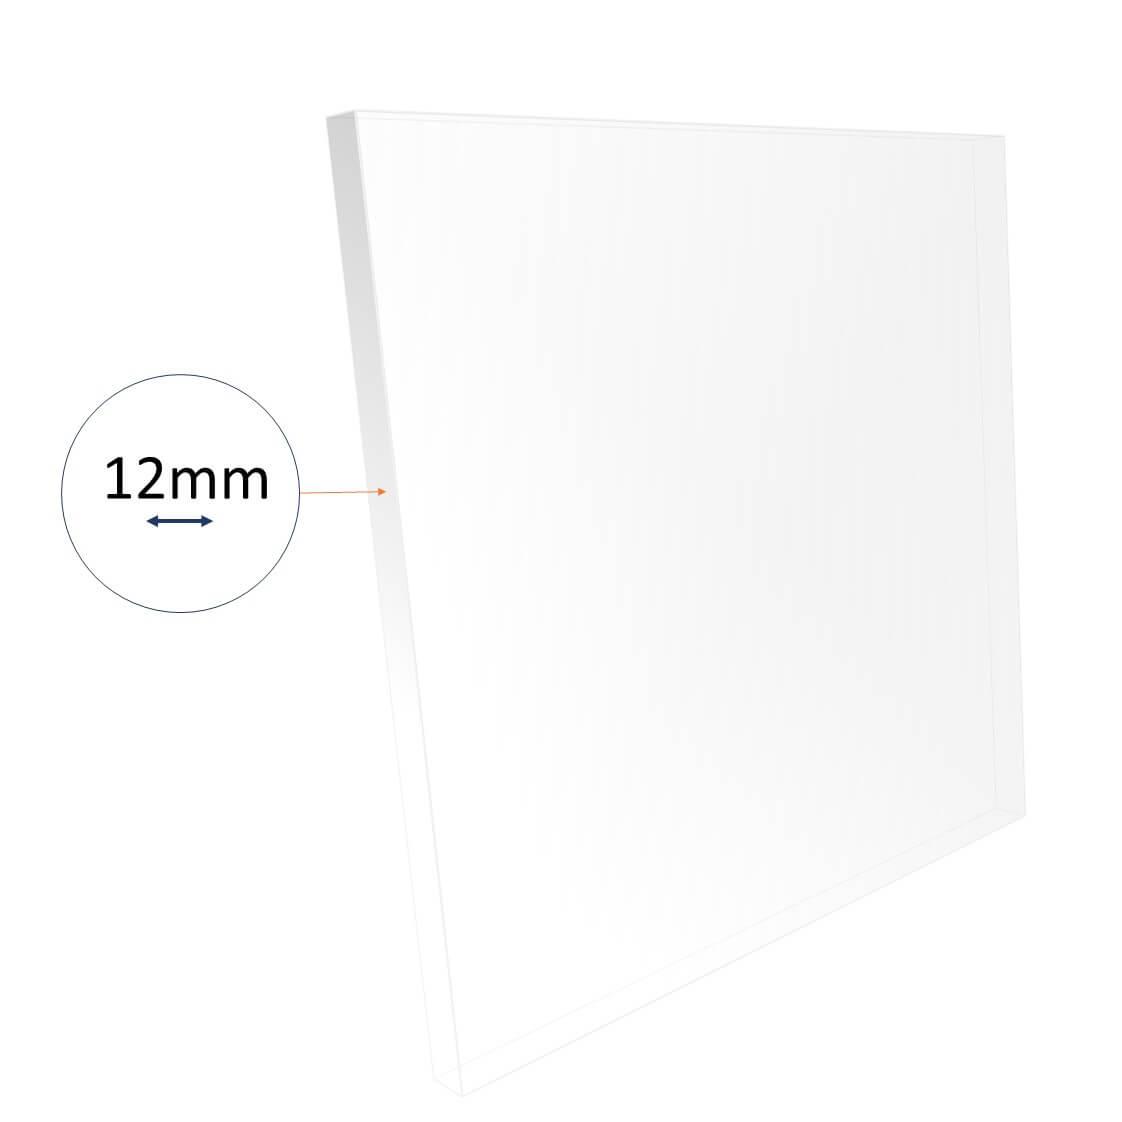 12mm acrylic sheet cut to size